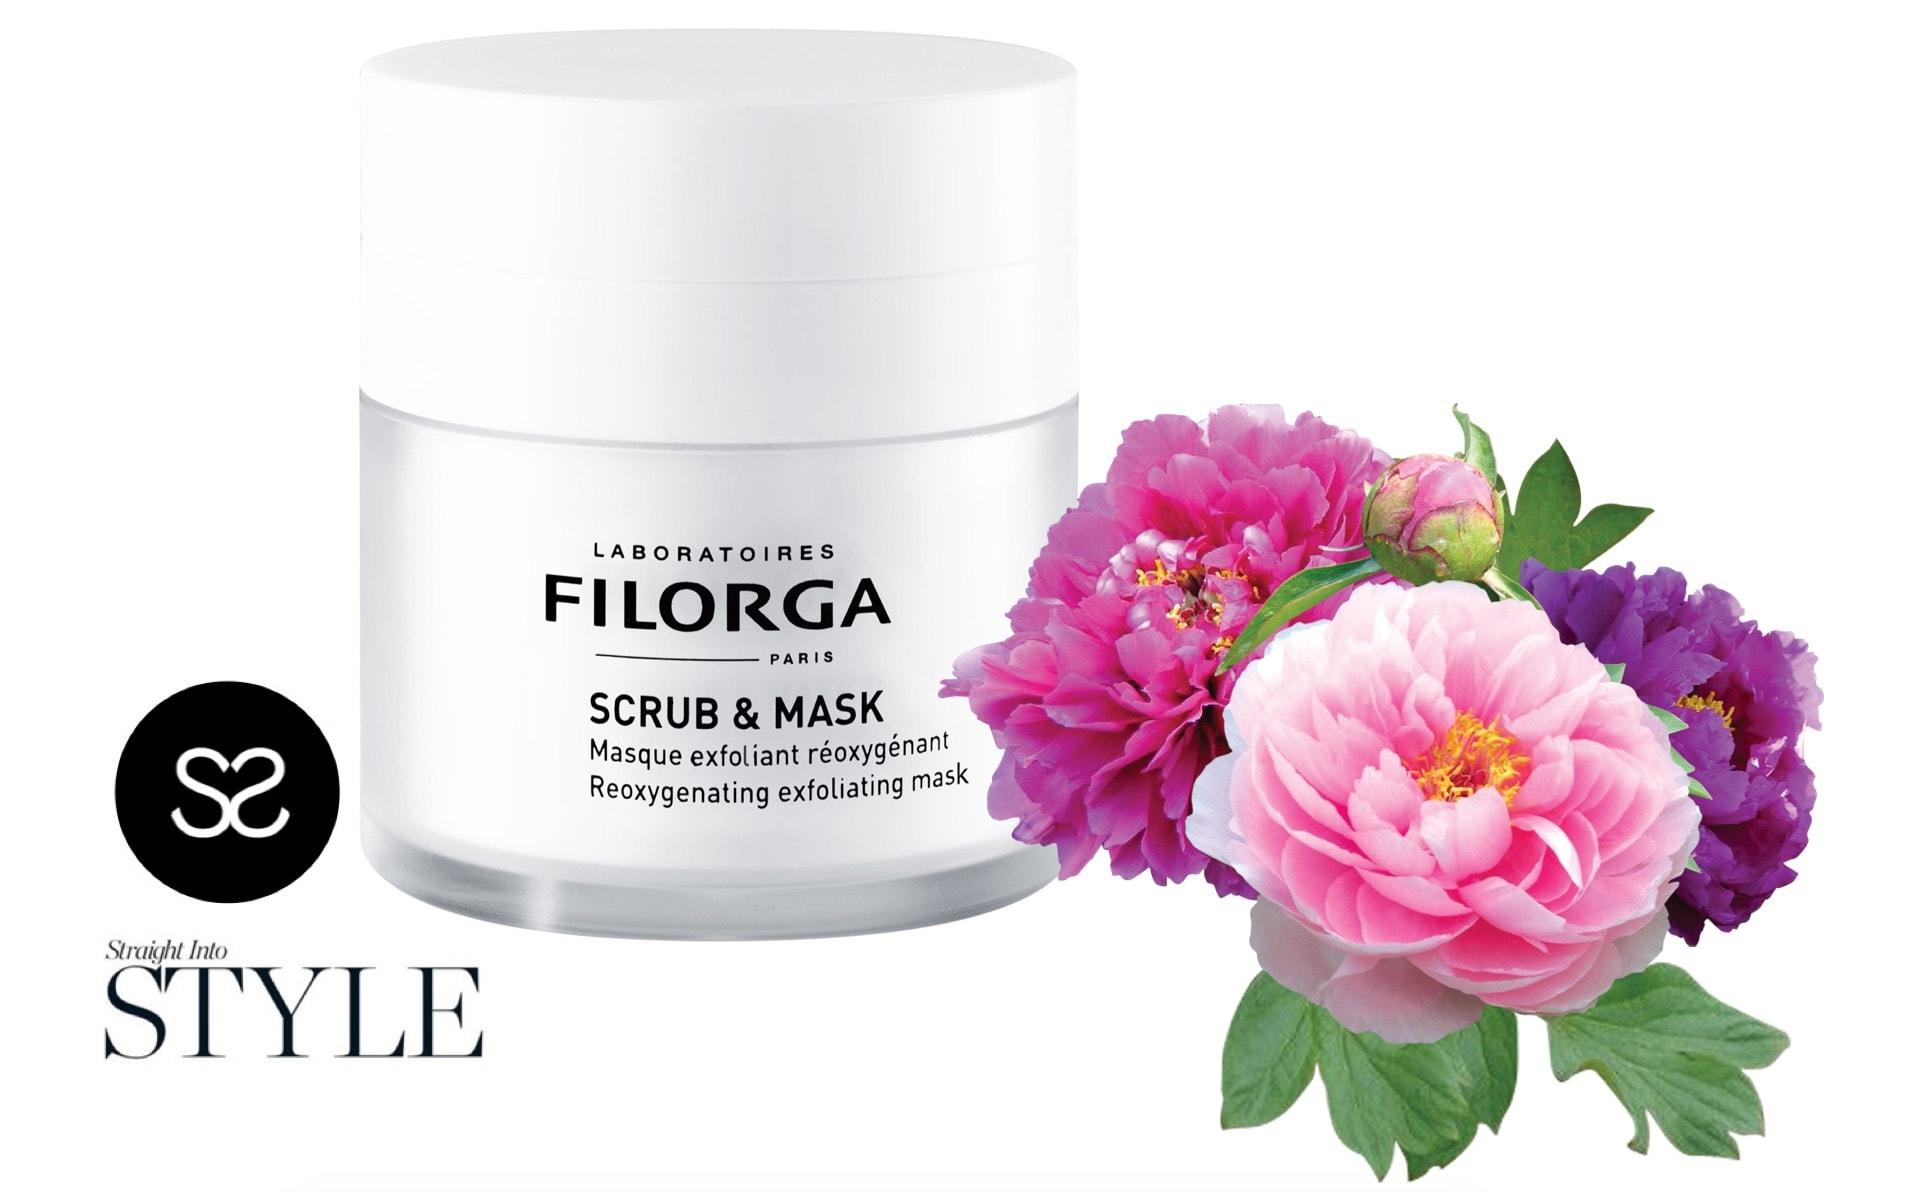 Filorga Scrub & Mask Reoxygenating Exfoliating Mask